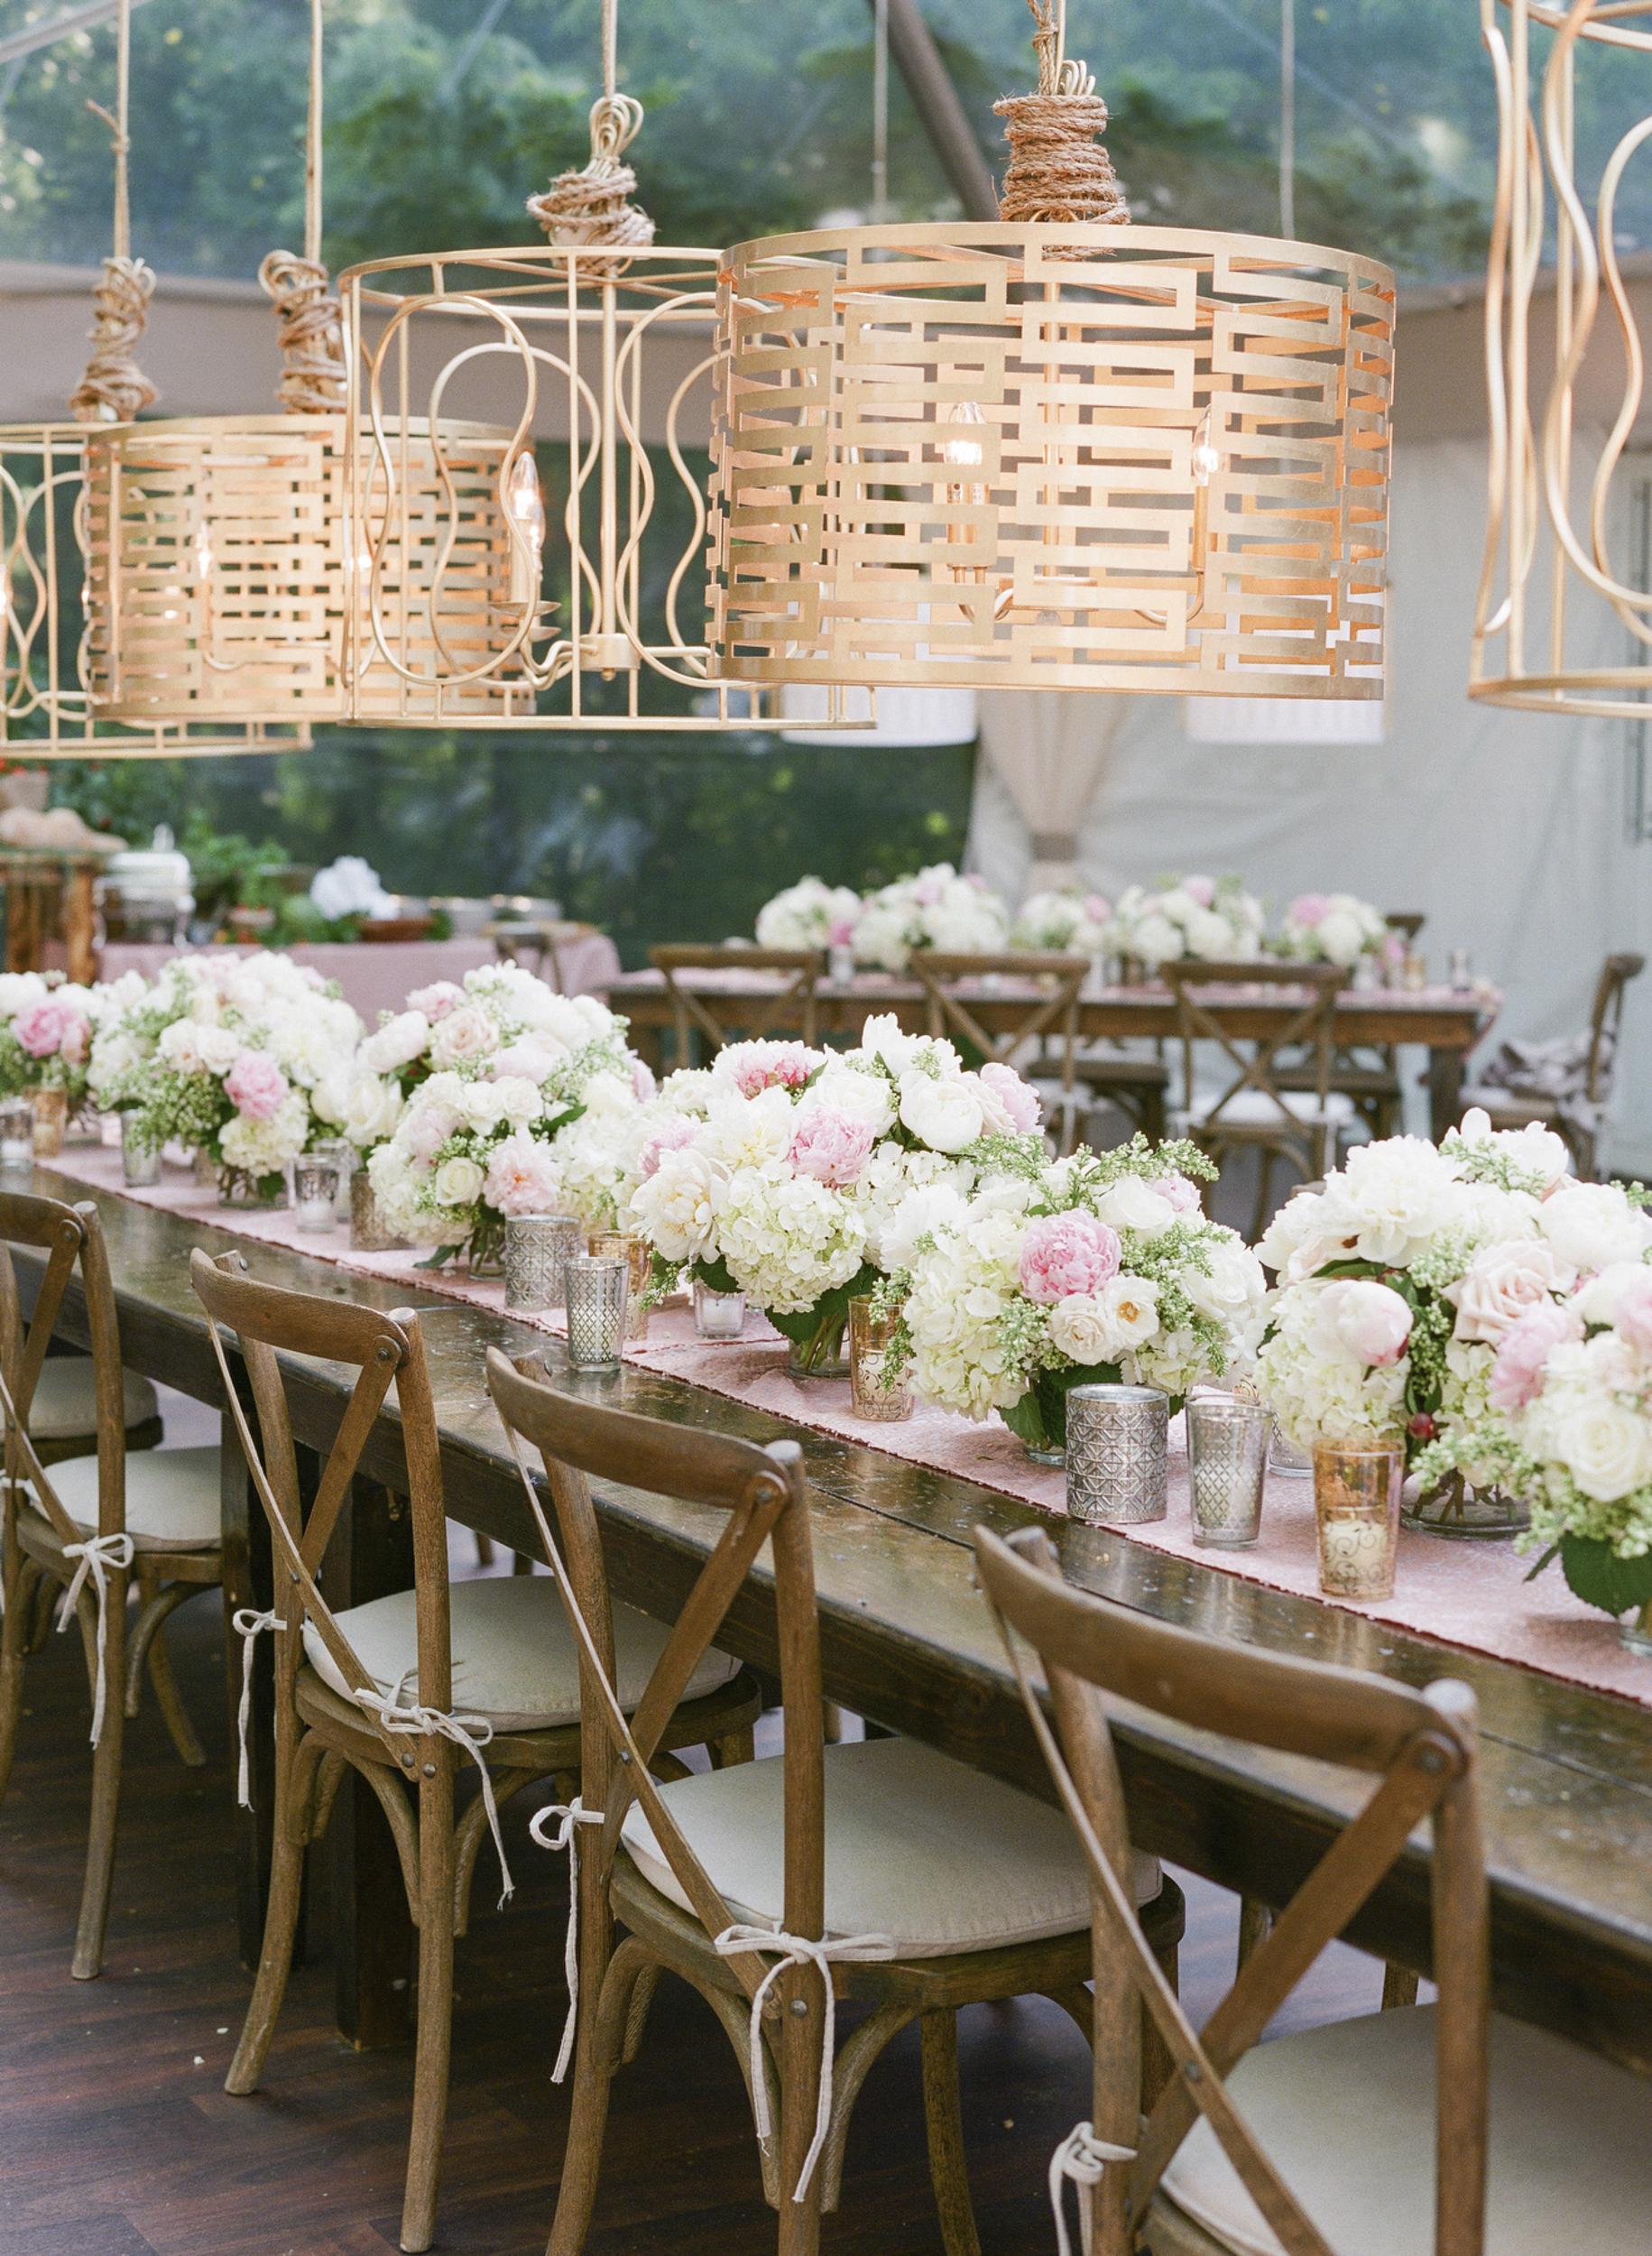 south_carolina_farm_wedding_rustic_chic_surprise_secret_luxe_wedding_bachelorette_emily_maynard_real_weddings-9.jpg